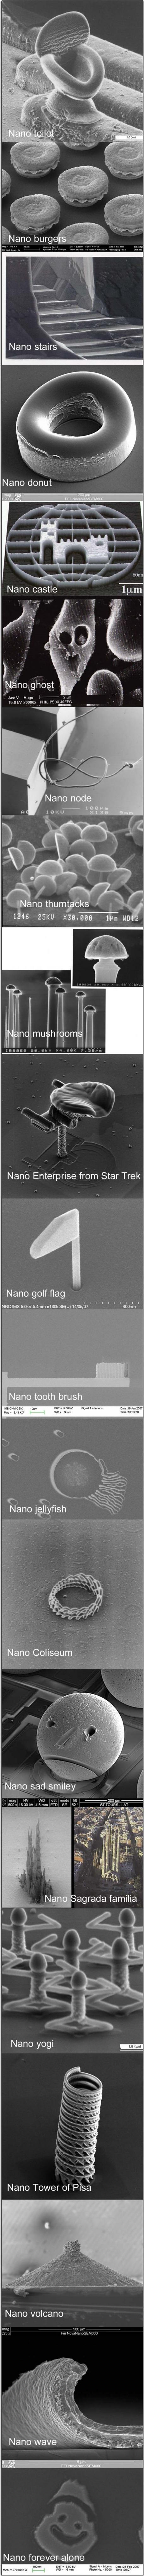 Interesting Nanotechnology Images Caught Through Microscope